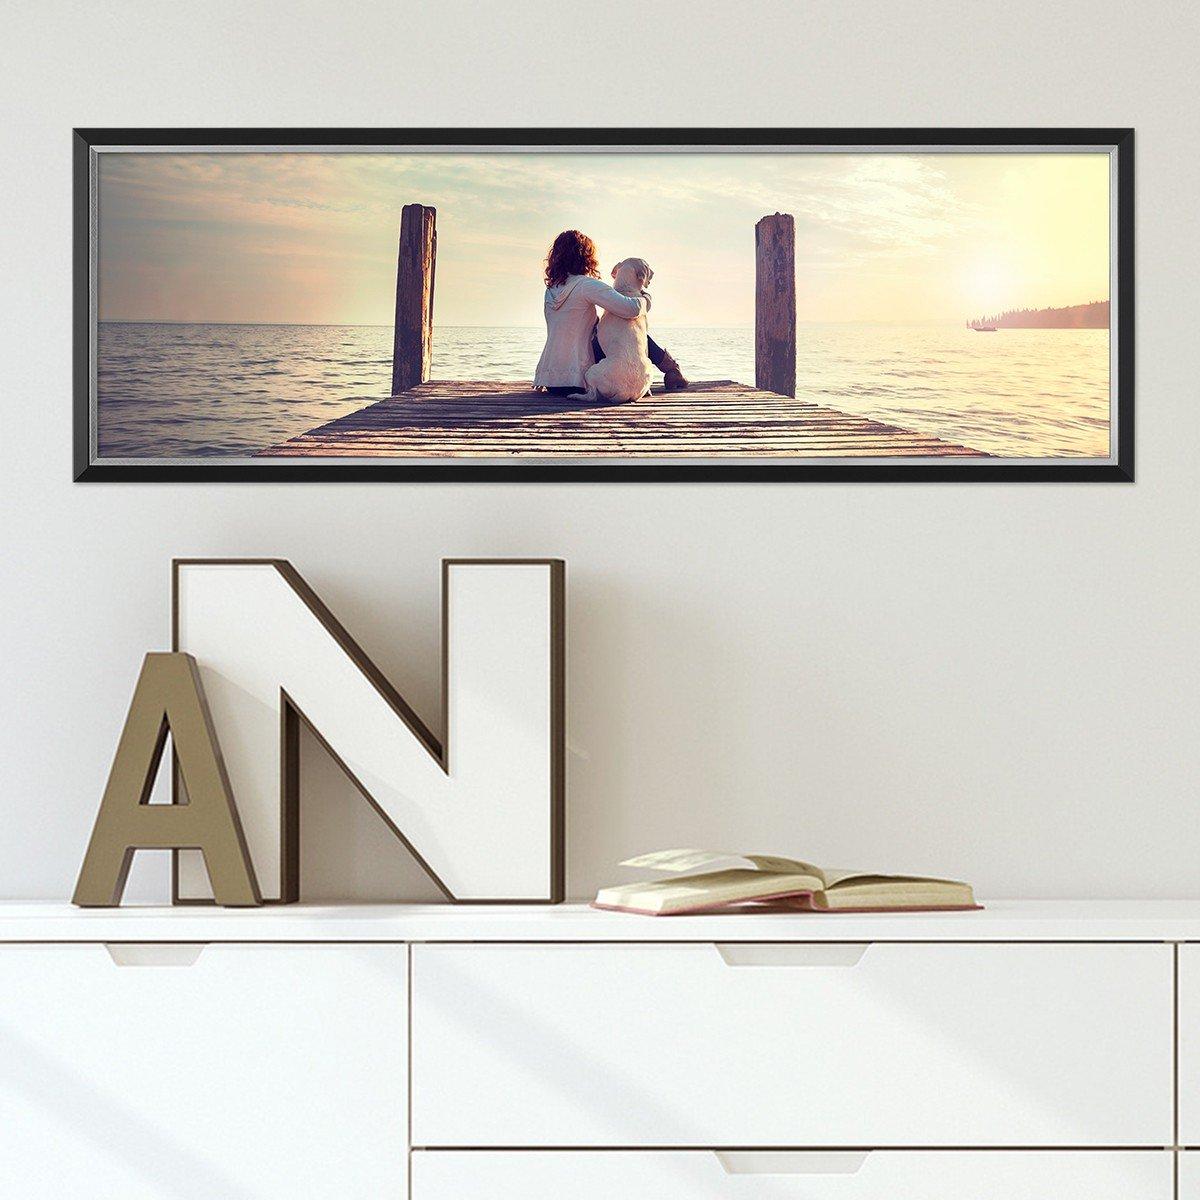 Atemberaubend 12 X 5 Panoramabilderrahmen Galerie - Rahmen Ideen ...